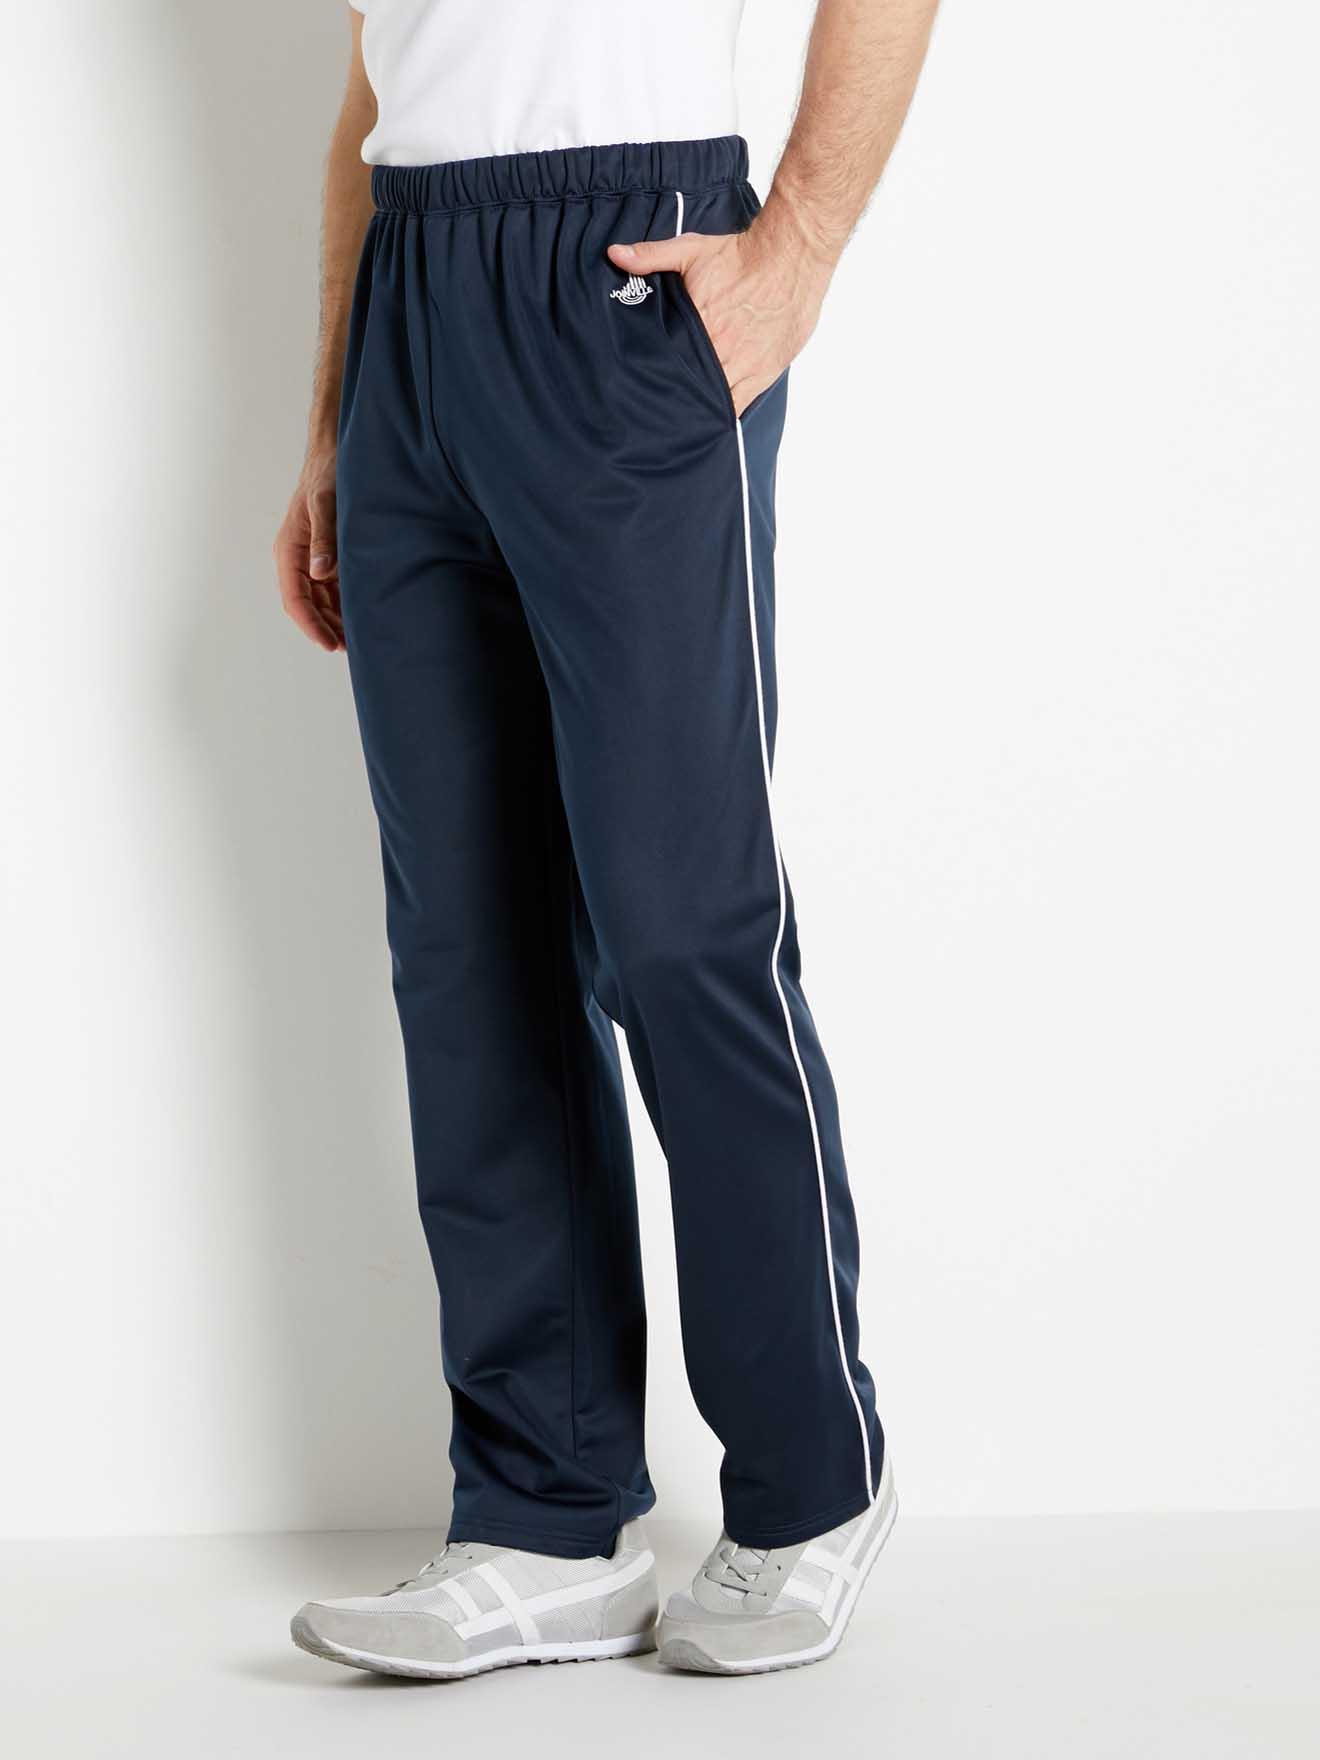 Molleton Pantalon Jogging De Sport Soldes ZRISfqwZ